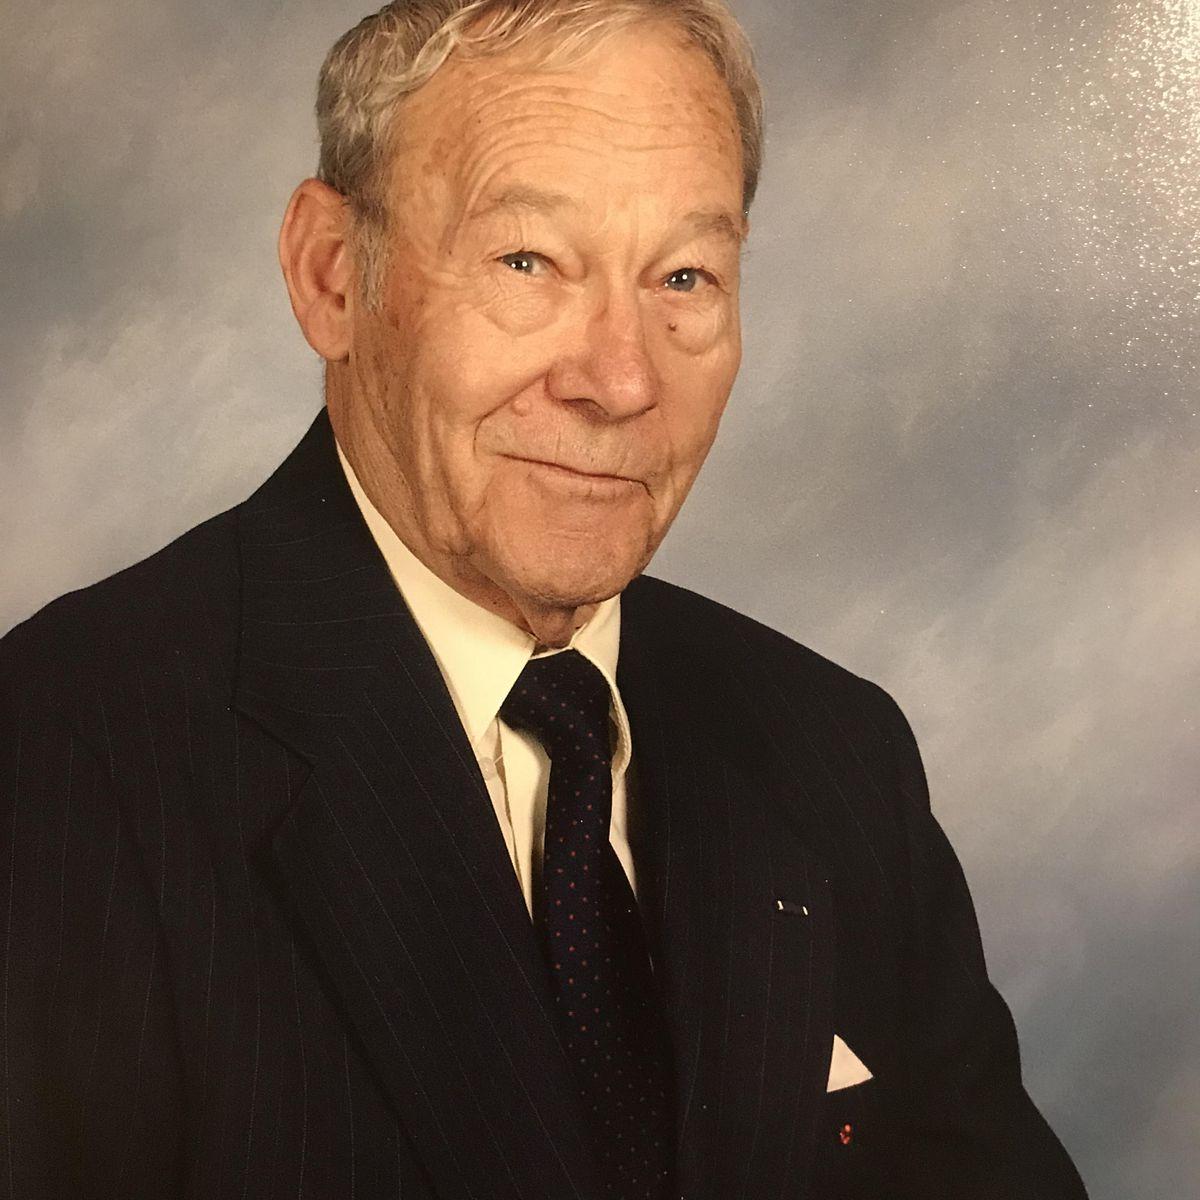 Edward A. Flanagan, 100, of Watertown